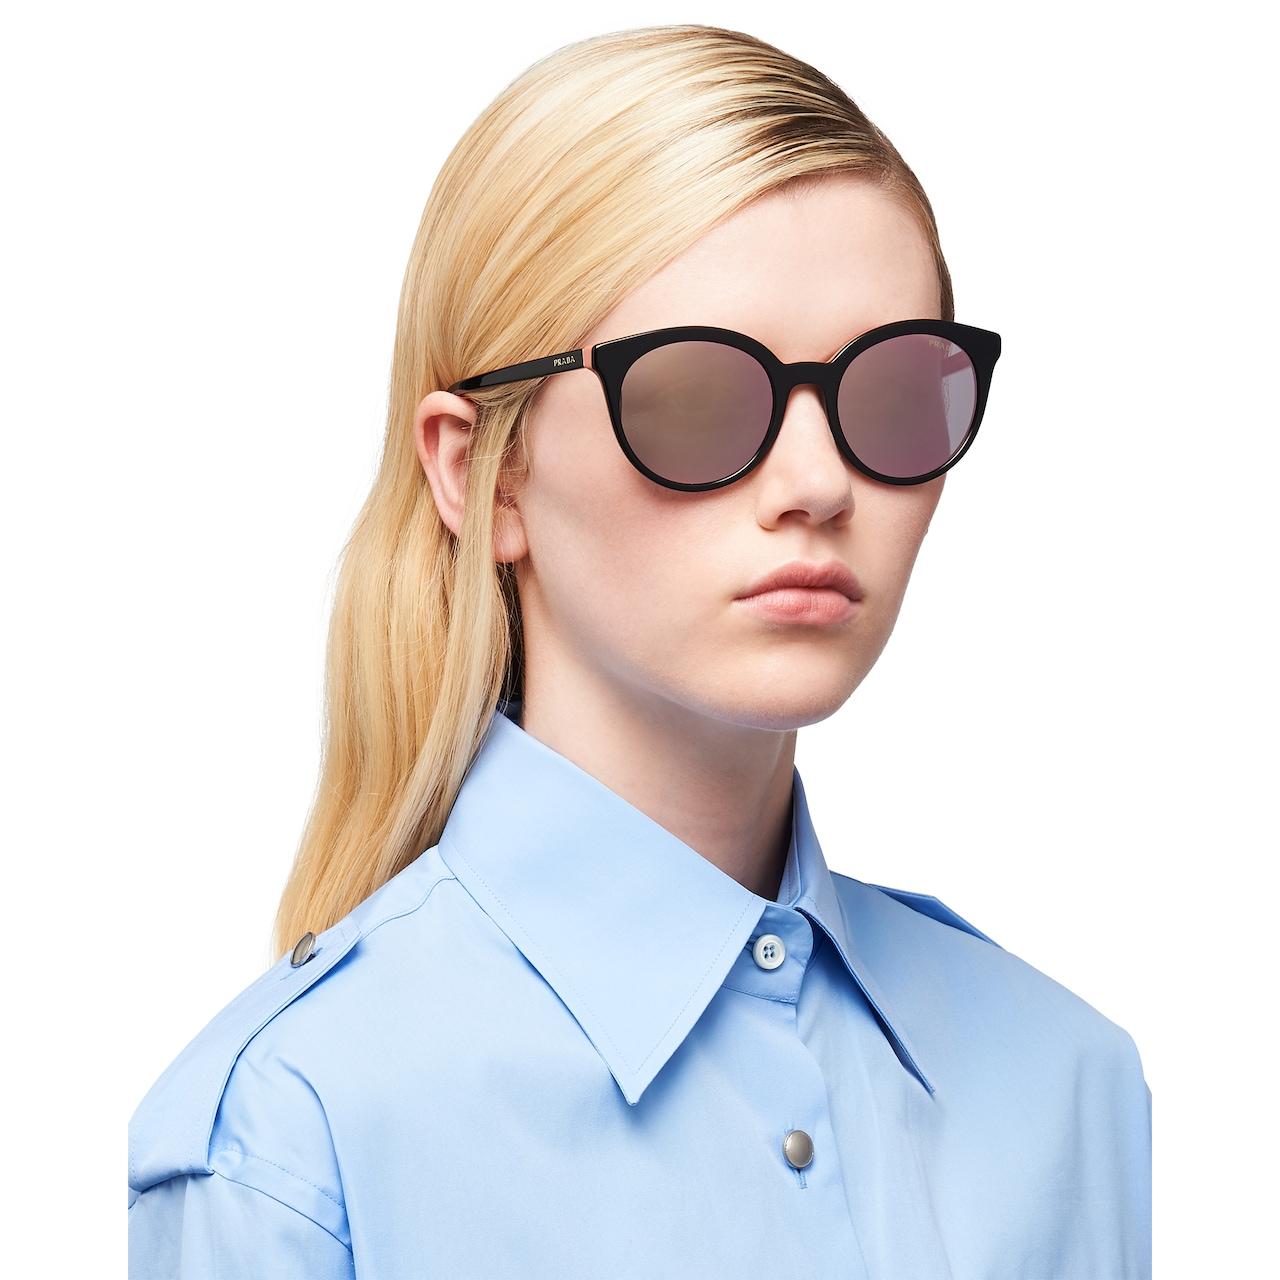 Prada Eyewear Collection sunglasses - Alternative fit